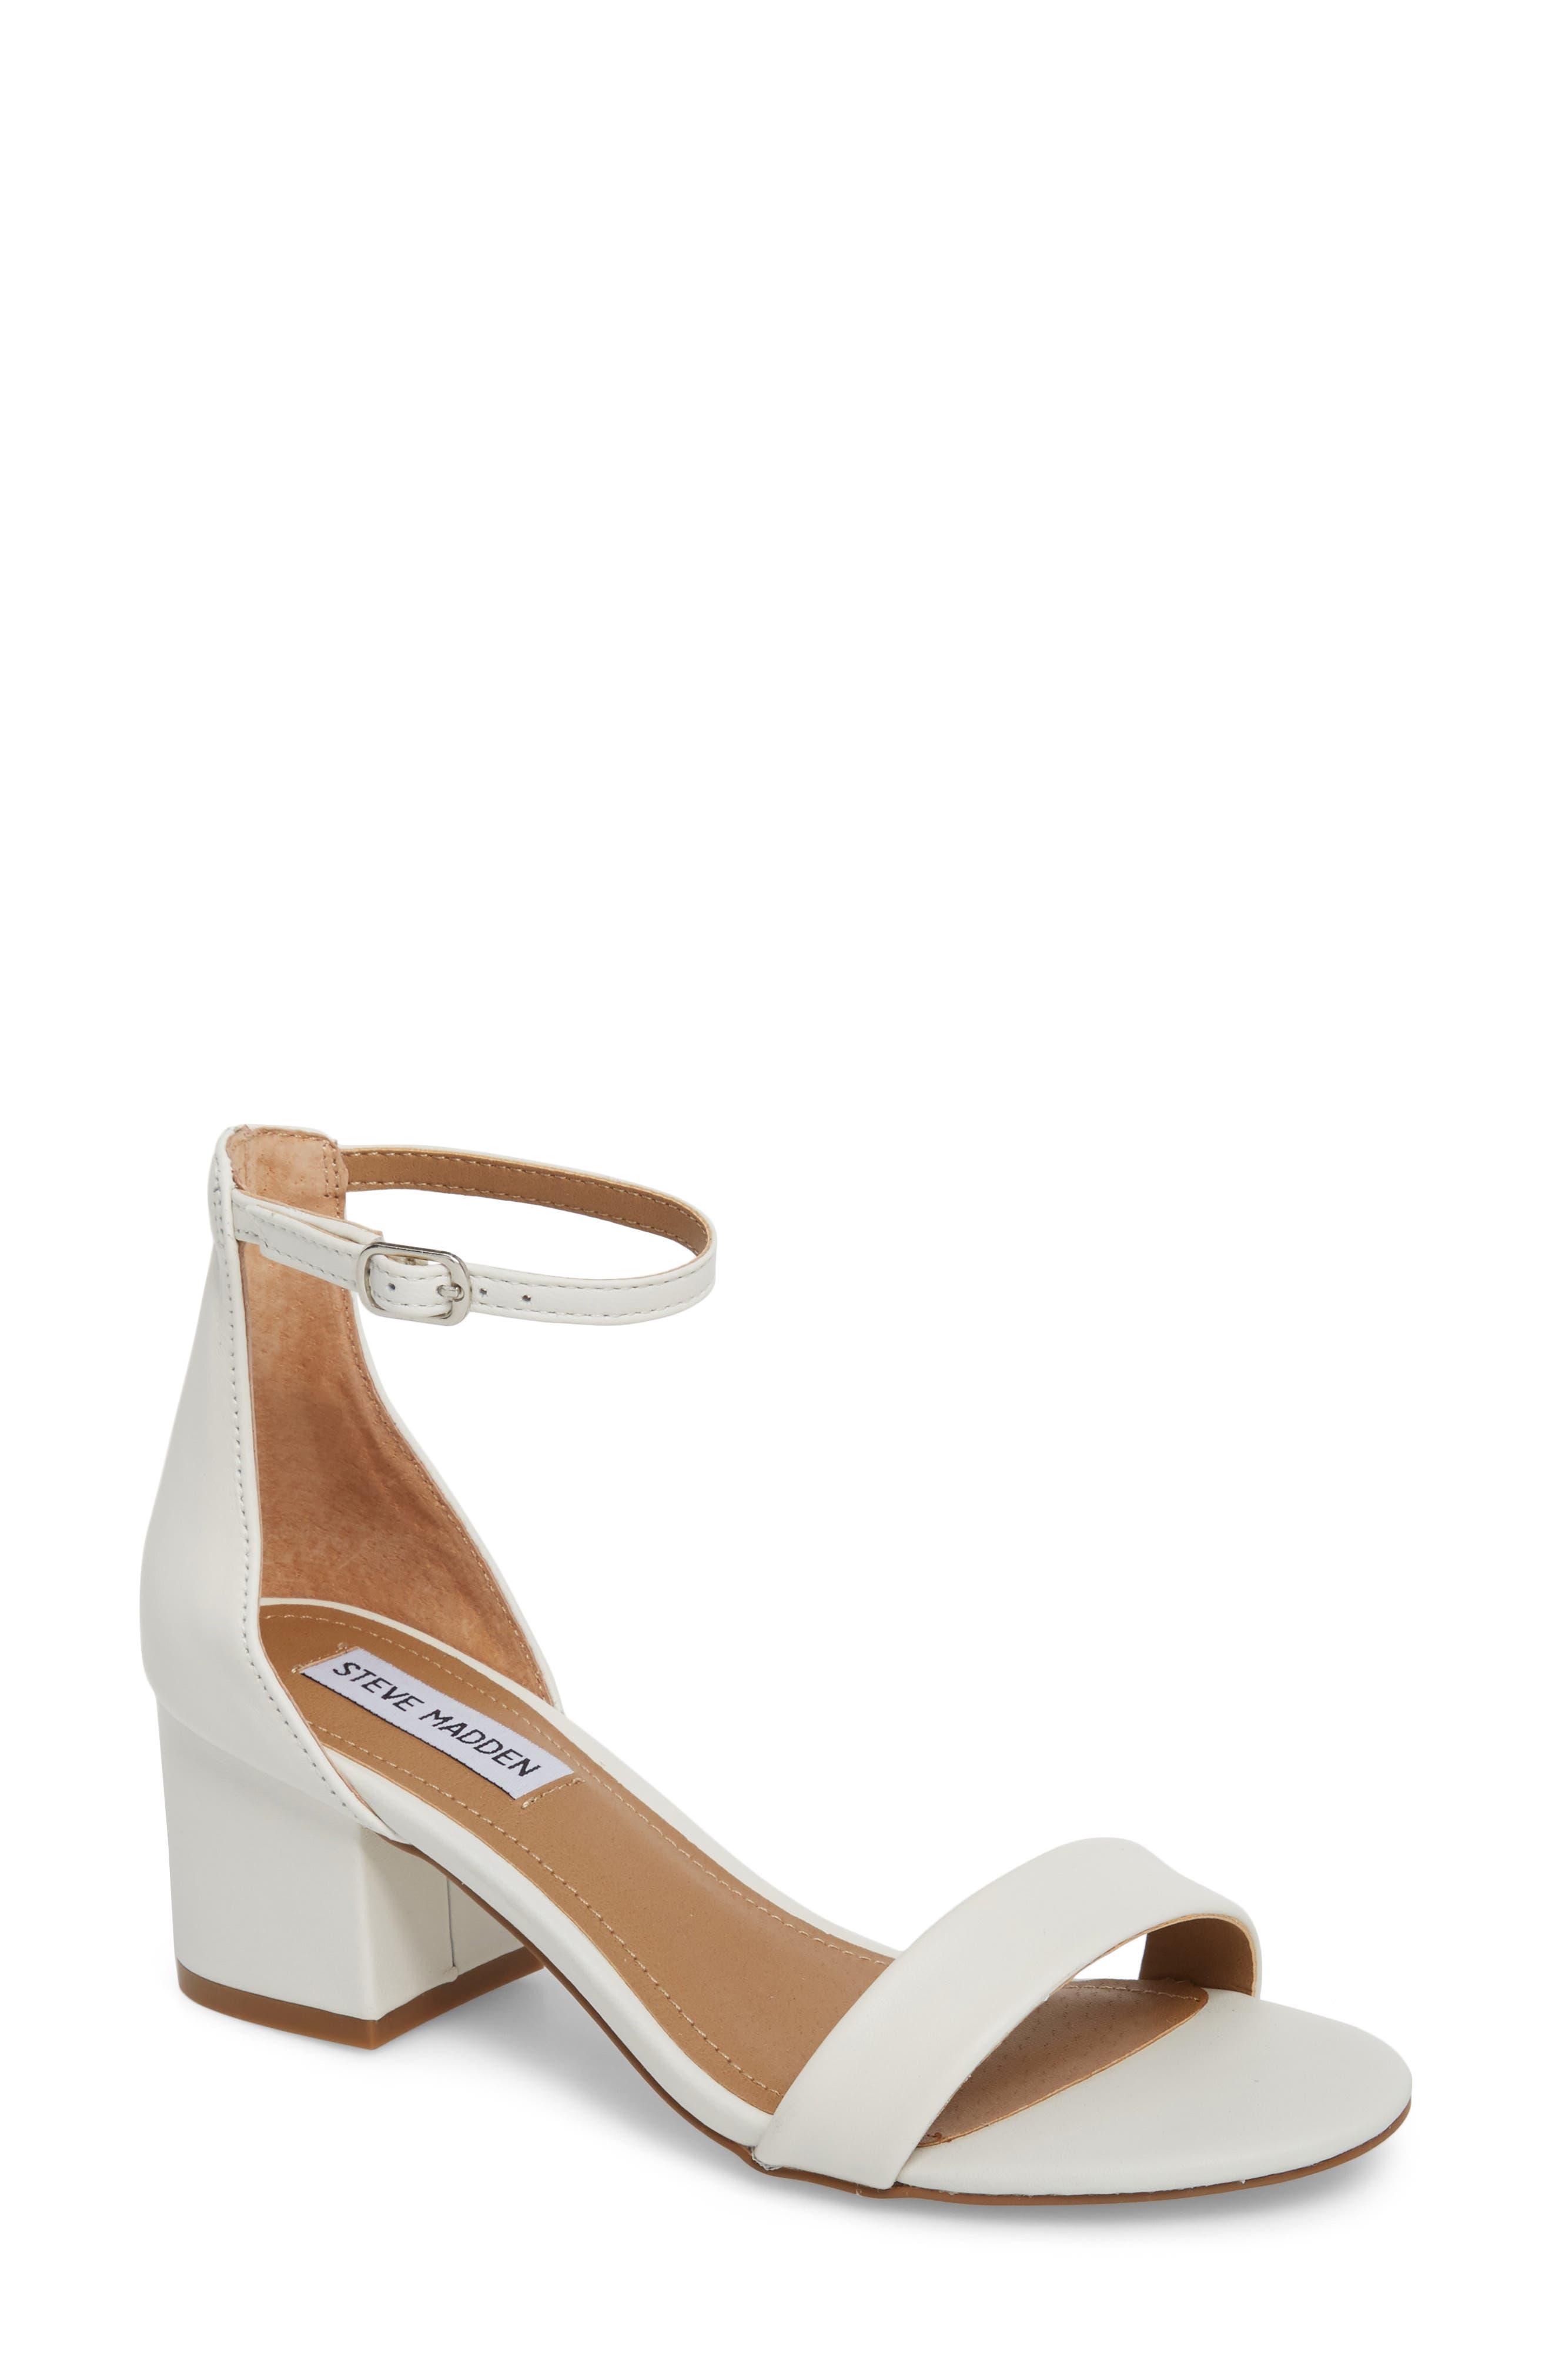 Irenee Ankle Strap Sandal,                             Main thumbnail 5, color,